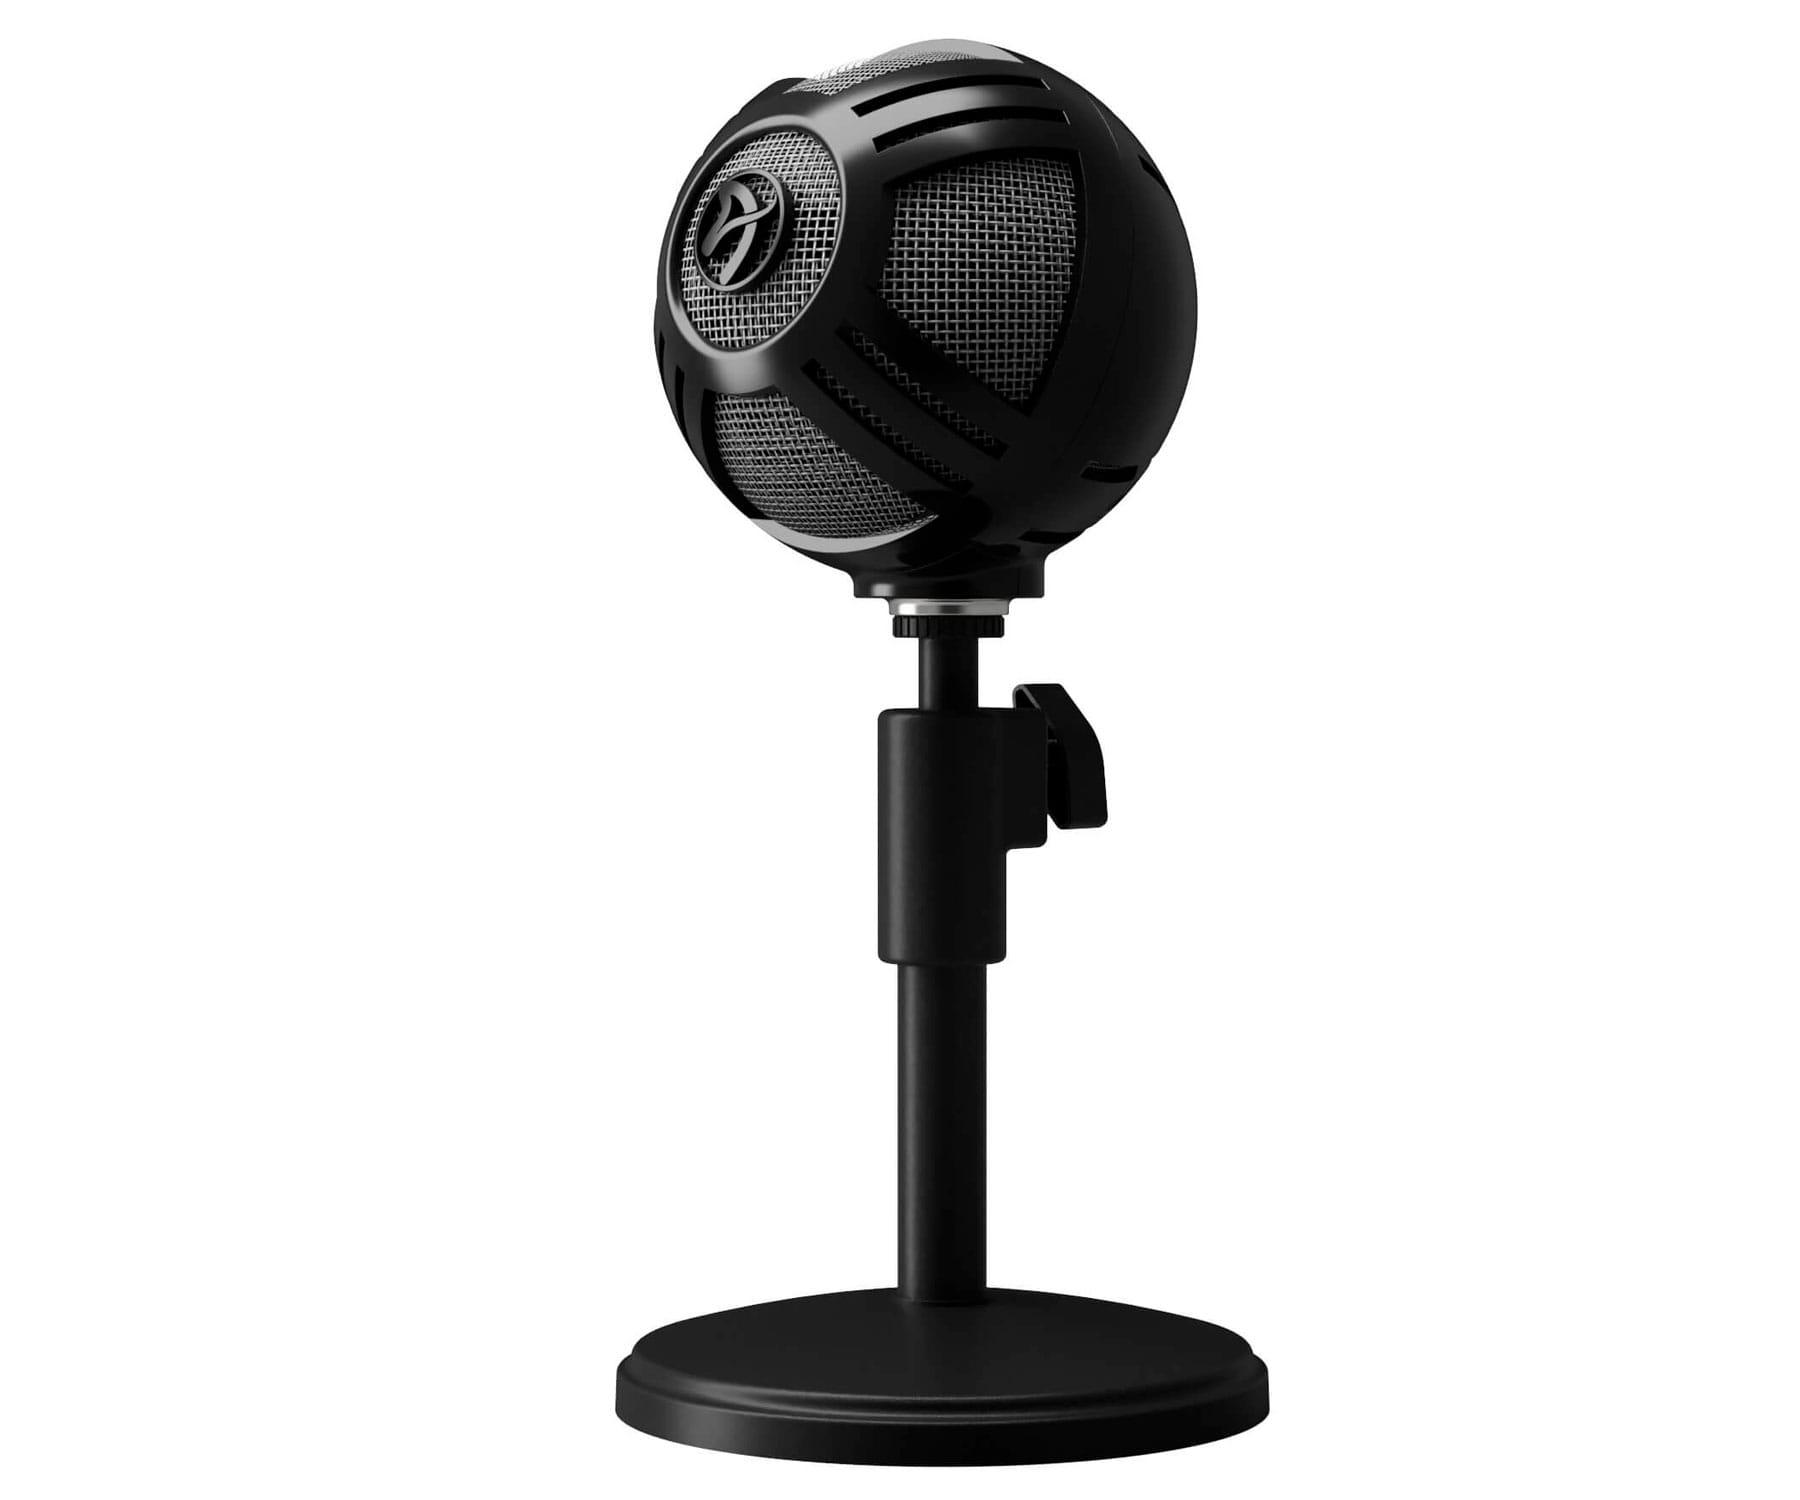 Arozzi Sfera Pro Micrófono Gaming Negro/USB/ Plug-and-play/Cardioide/Omnidireccional